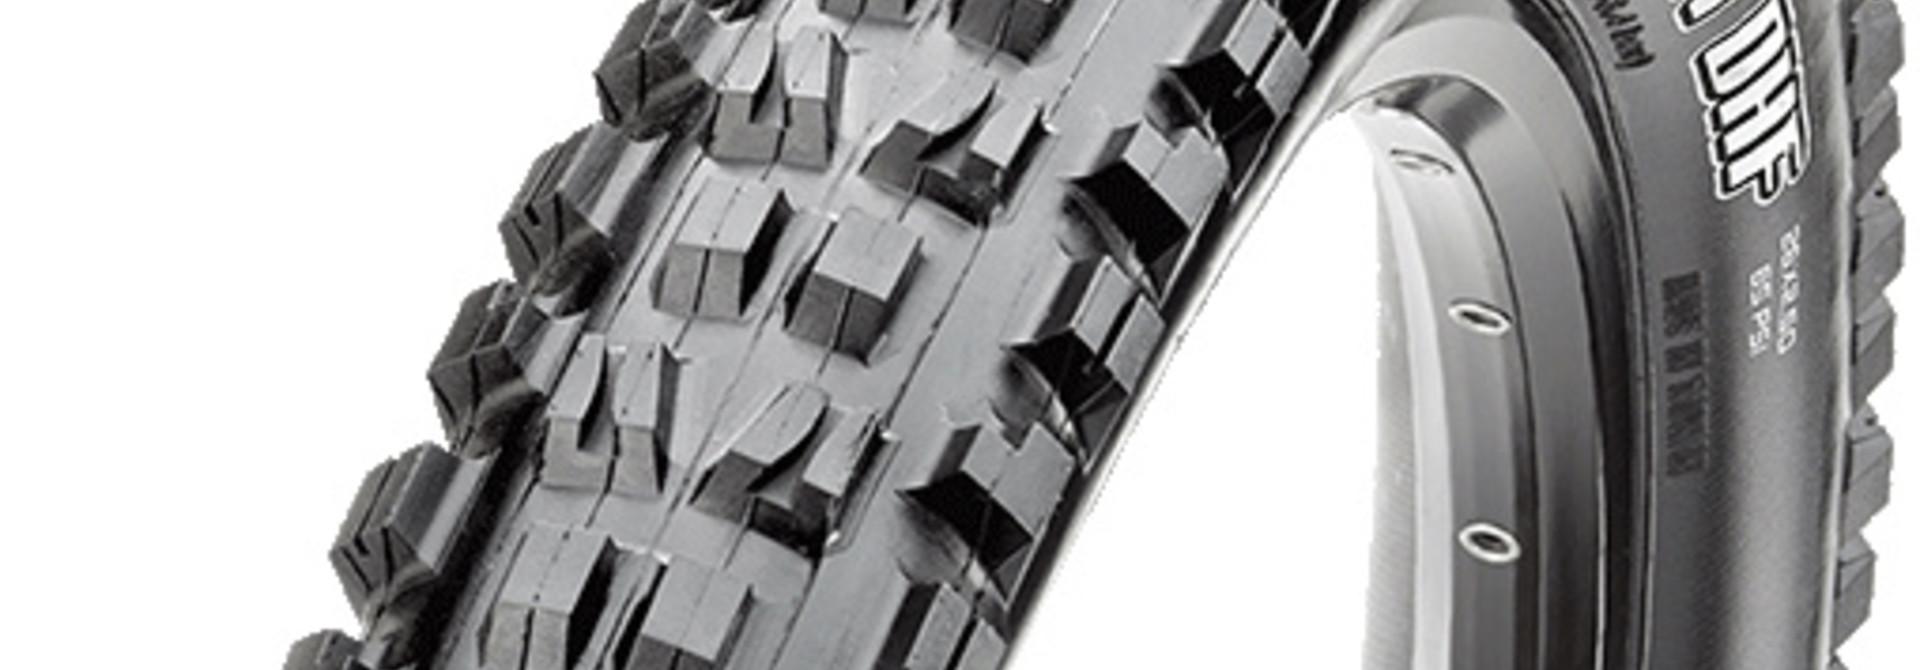 Maxxis Minion DHF Tire - 29 x 2.5, Tubeless, Folding, Black, 3C Maxx Terra, EXO, Wide Trail